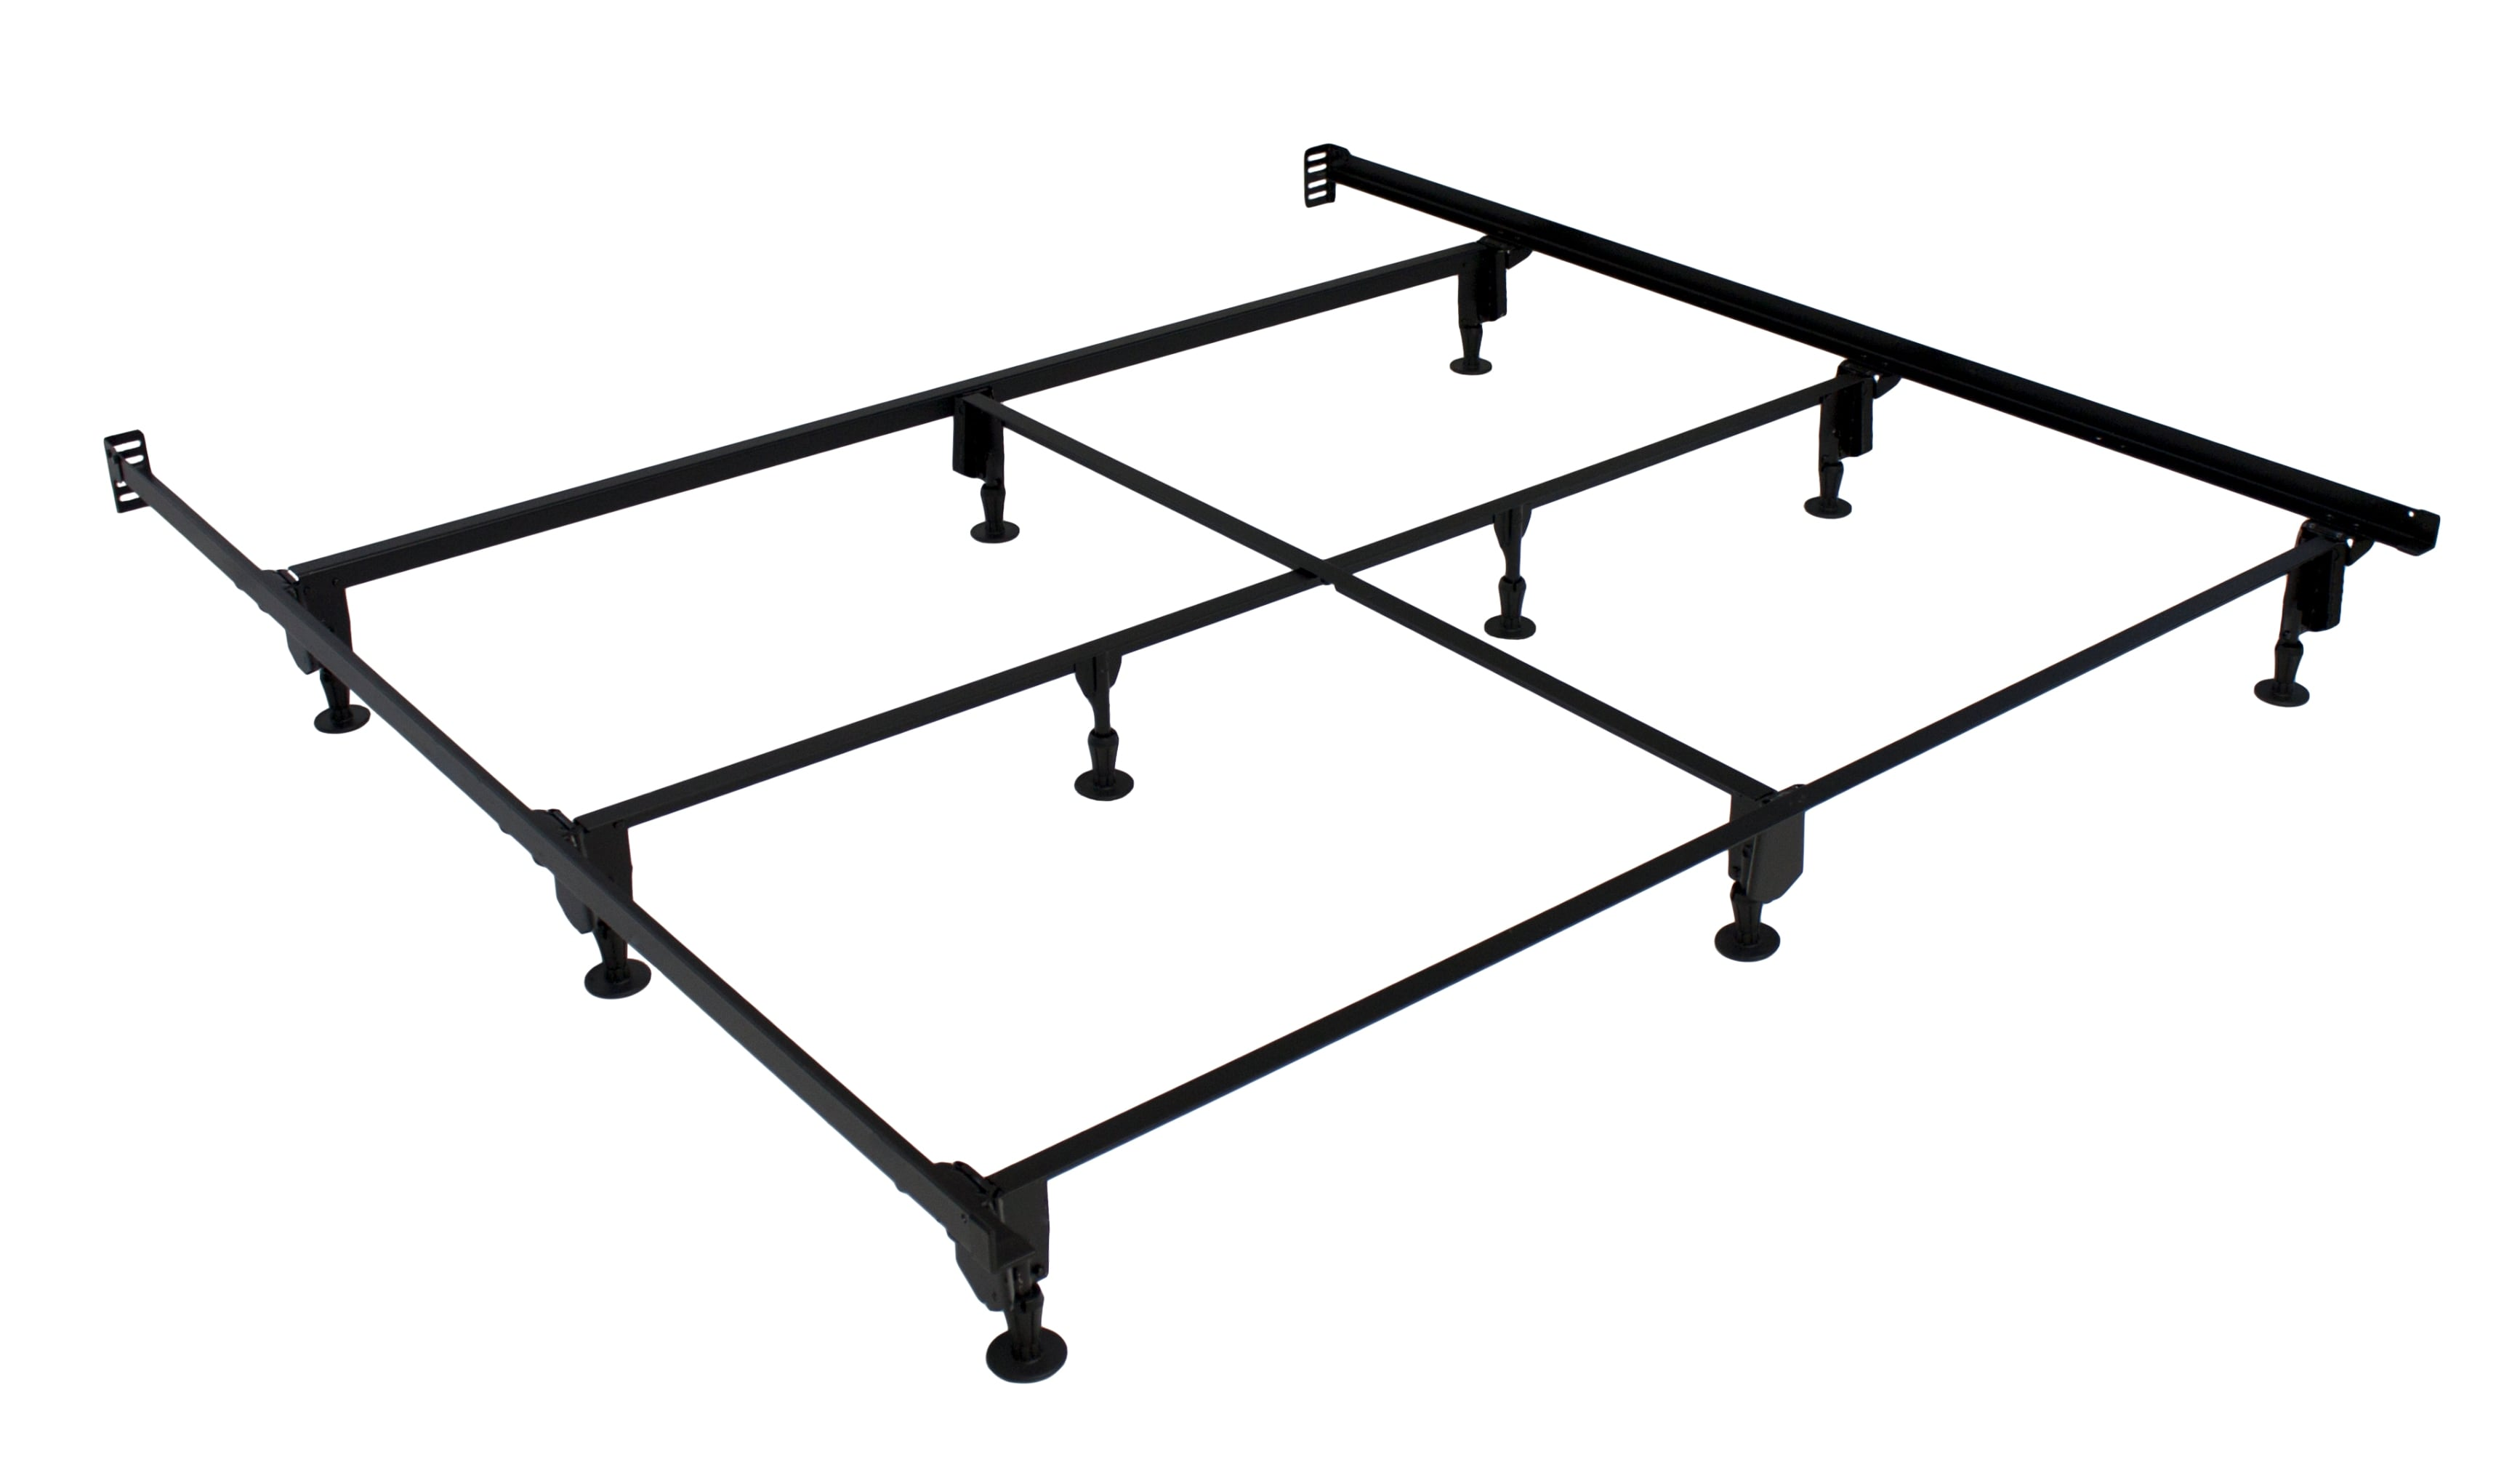 king bed frames overstock shopping the best prices online. Black Bedroom Furniture Sets. Home Design Ideas